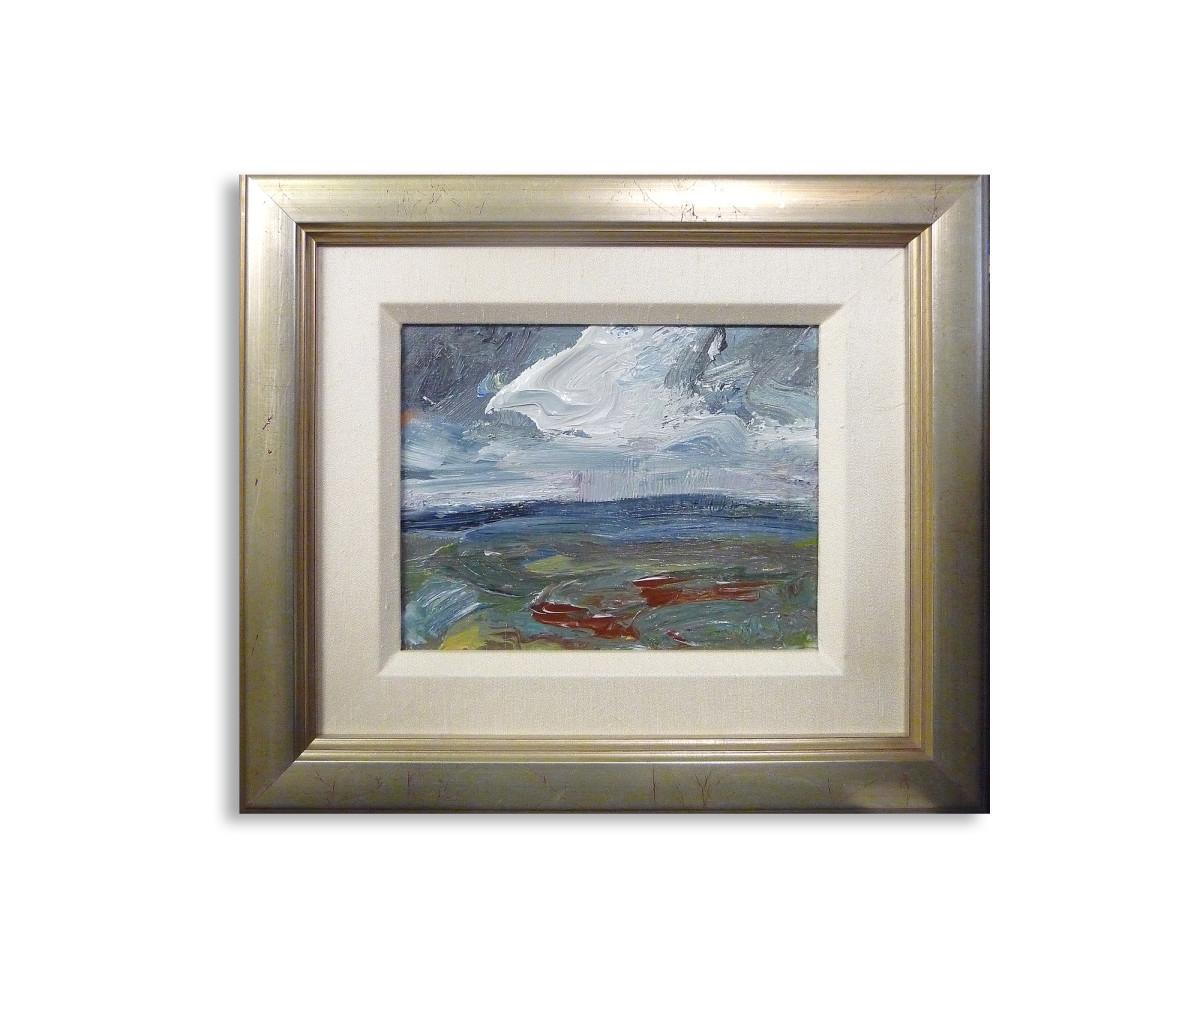 0499 - Sea and Sky by Matt Petley-Jones